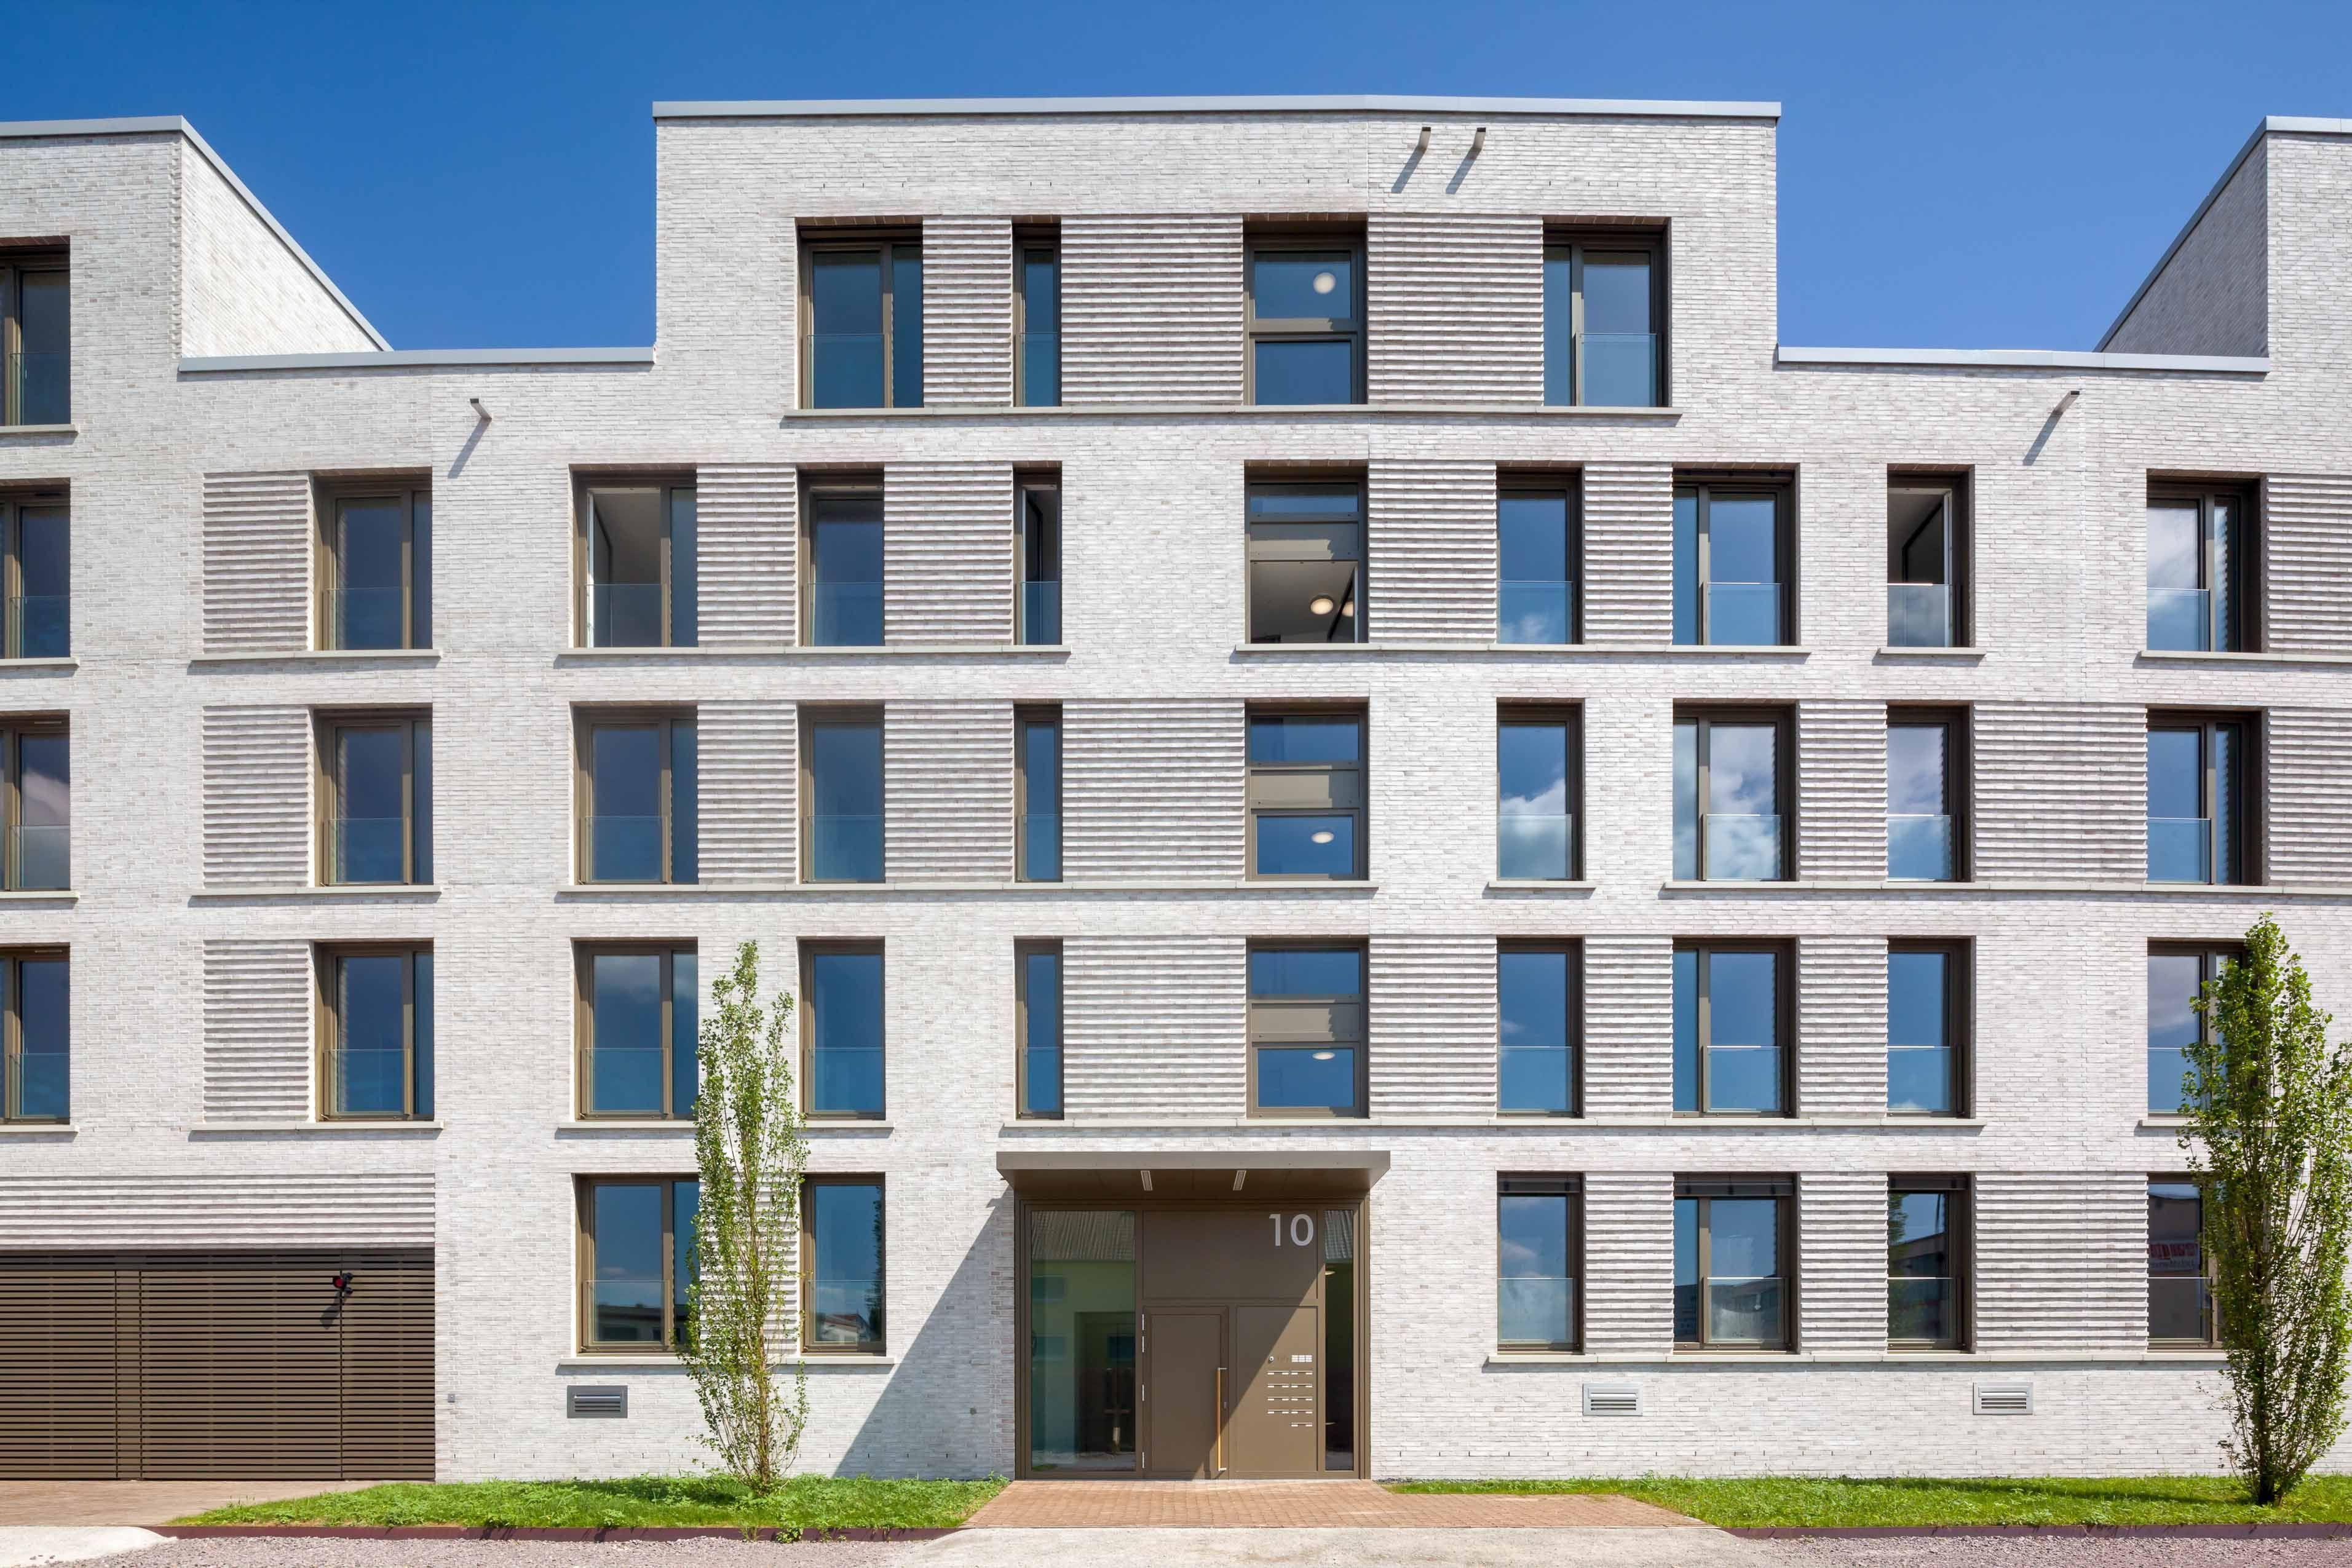 Wohnen an Fluß, Speyer 2019